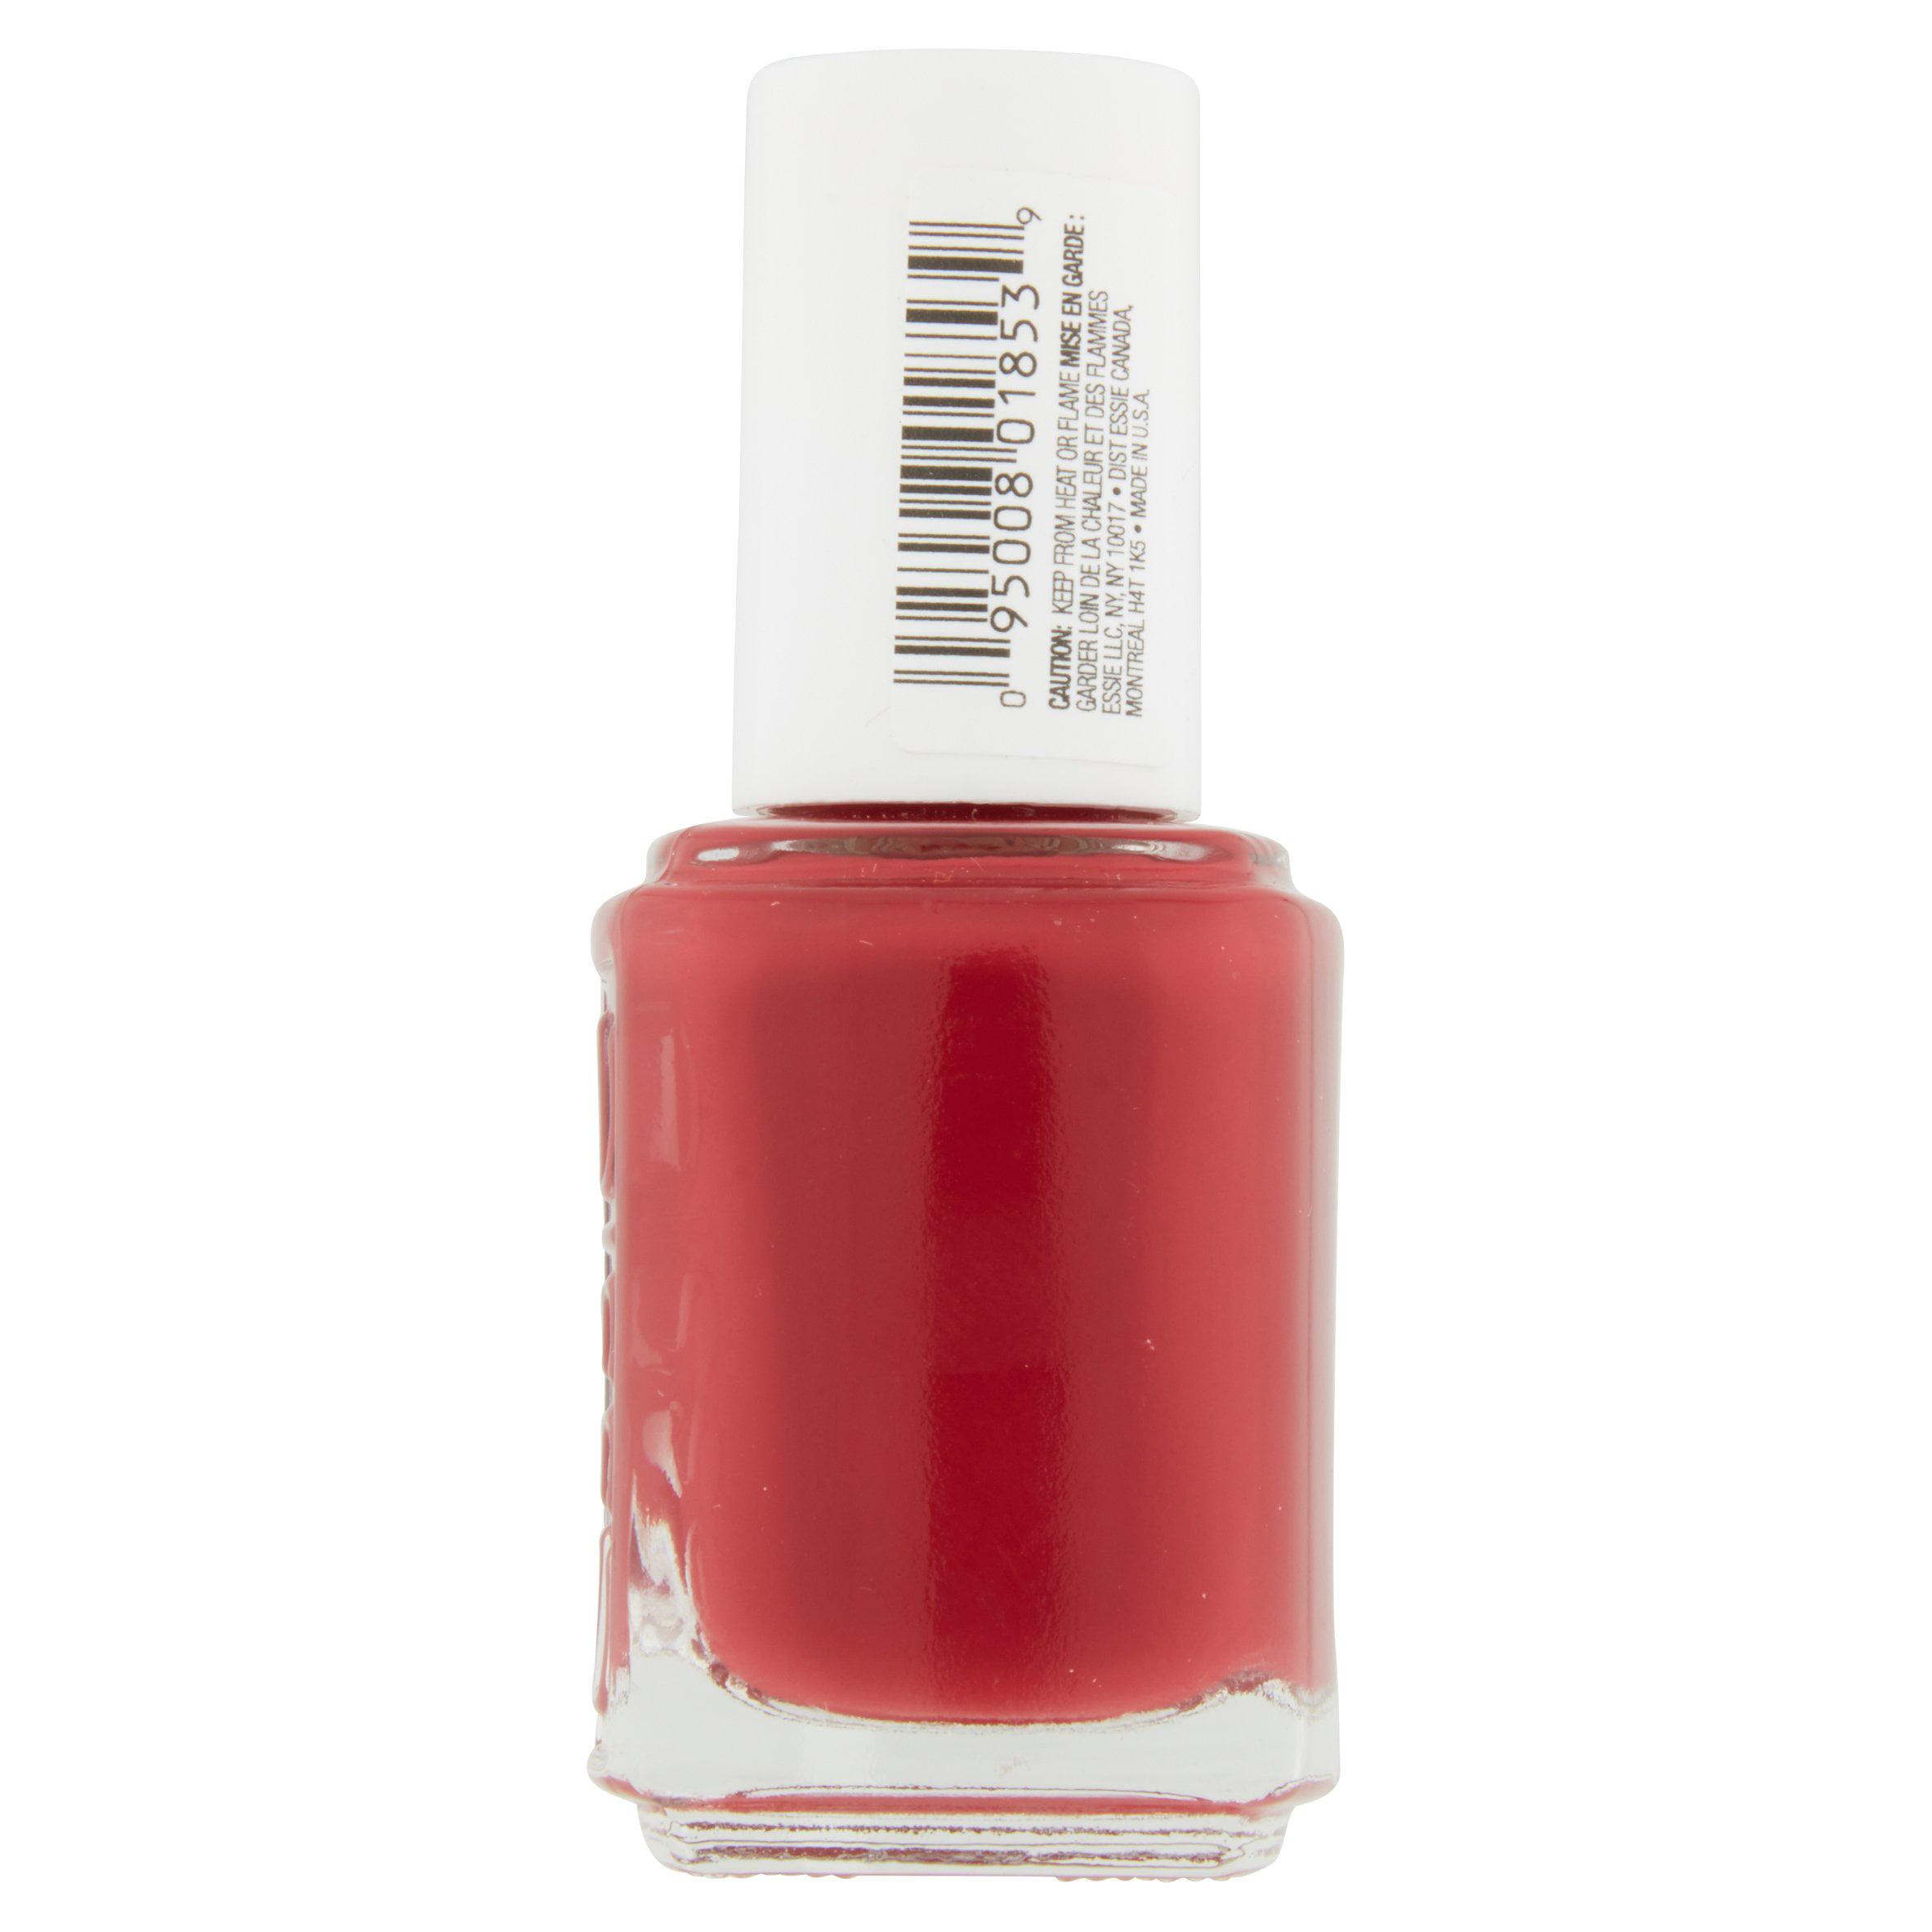 Essie Nail Polish (Reds) With The Band, 0.46 fl oz - Walmart.com